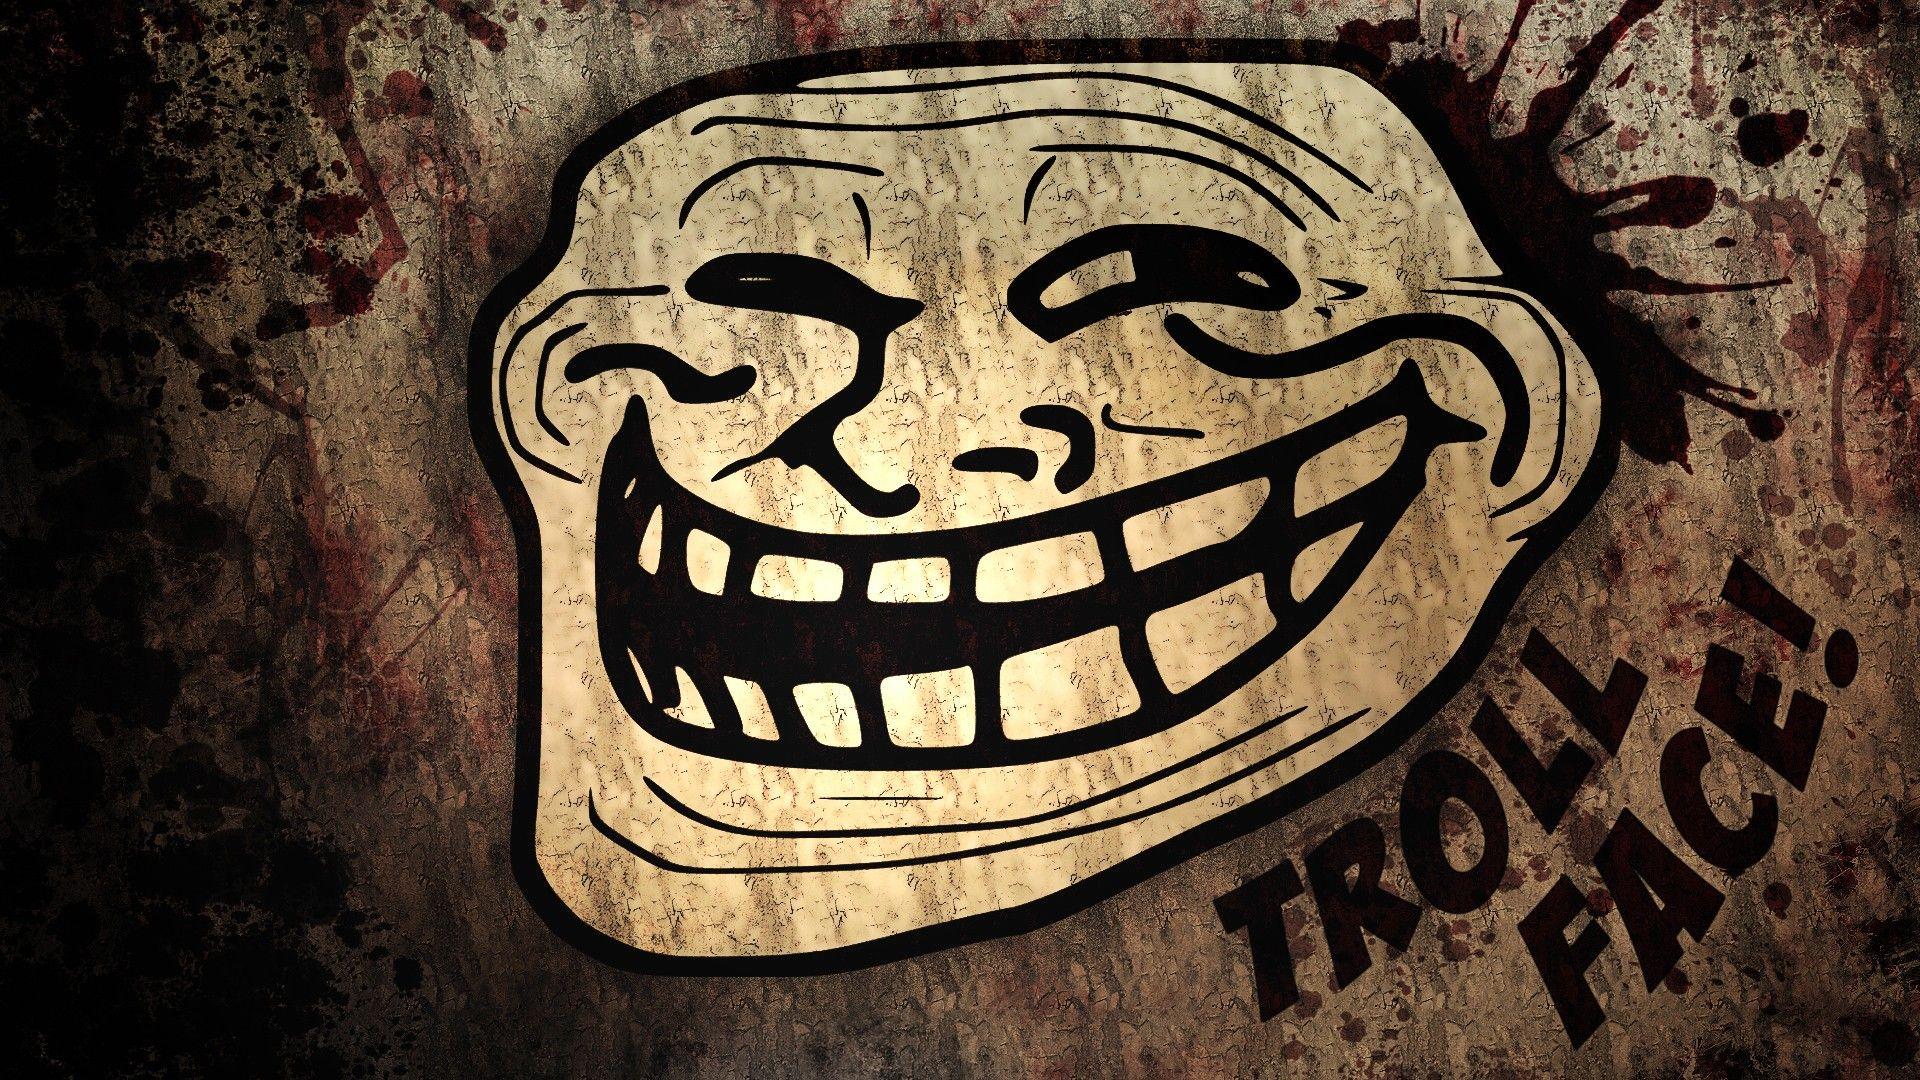 Funny Meme Phone Wallpapers : Pin by yvonne serrano on josh son age 21 pinterest troll face